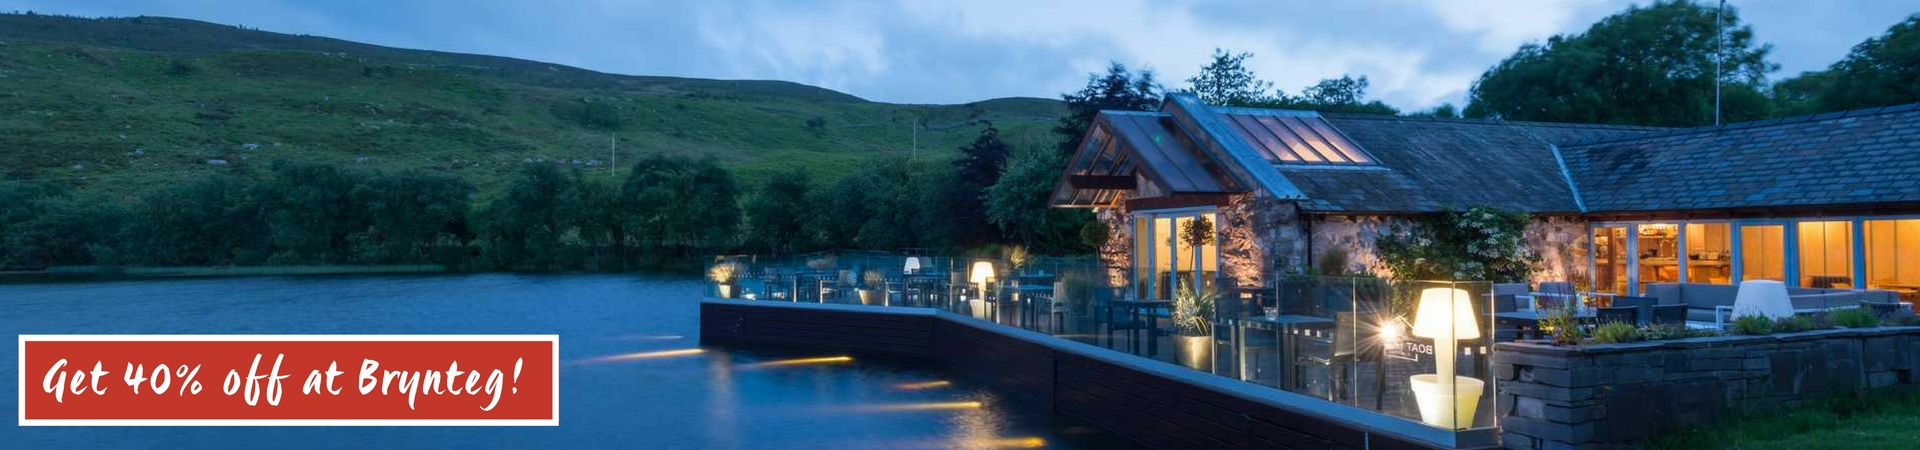 Brynteg Holiday Park in Snowdonia